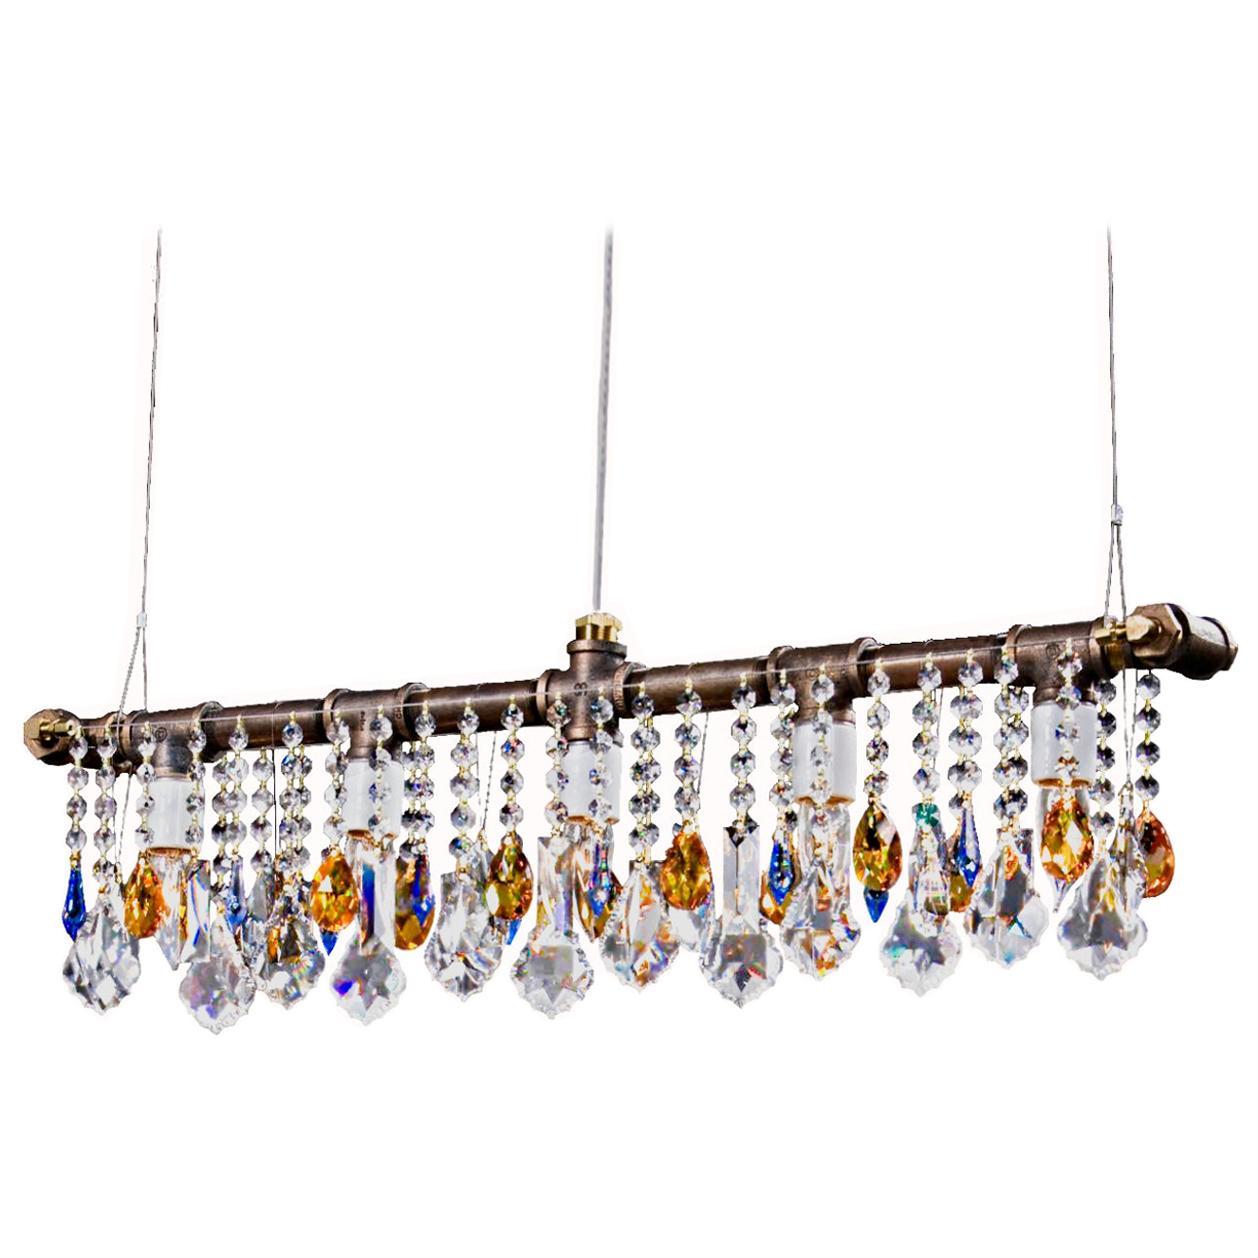 Industrial Bar Five-Light Bronze Chandelier Linear Suspension